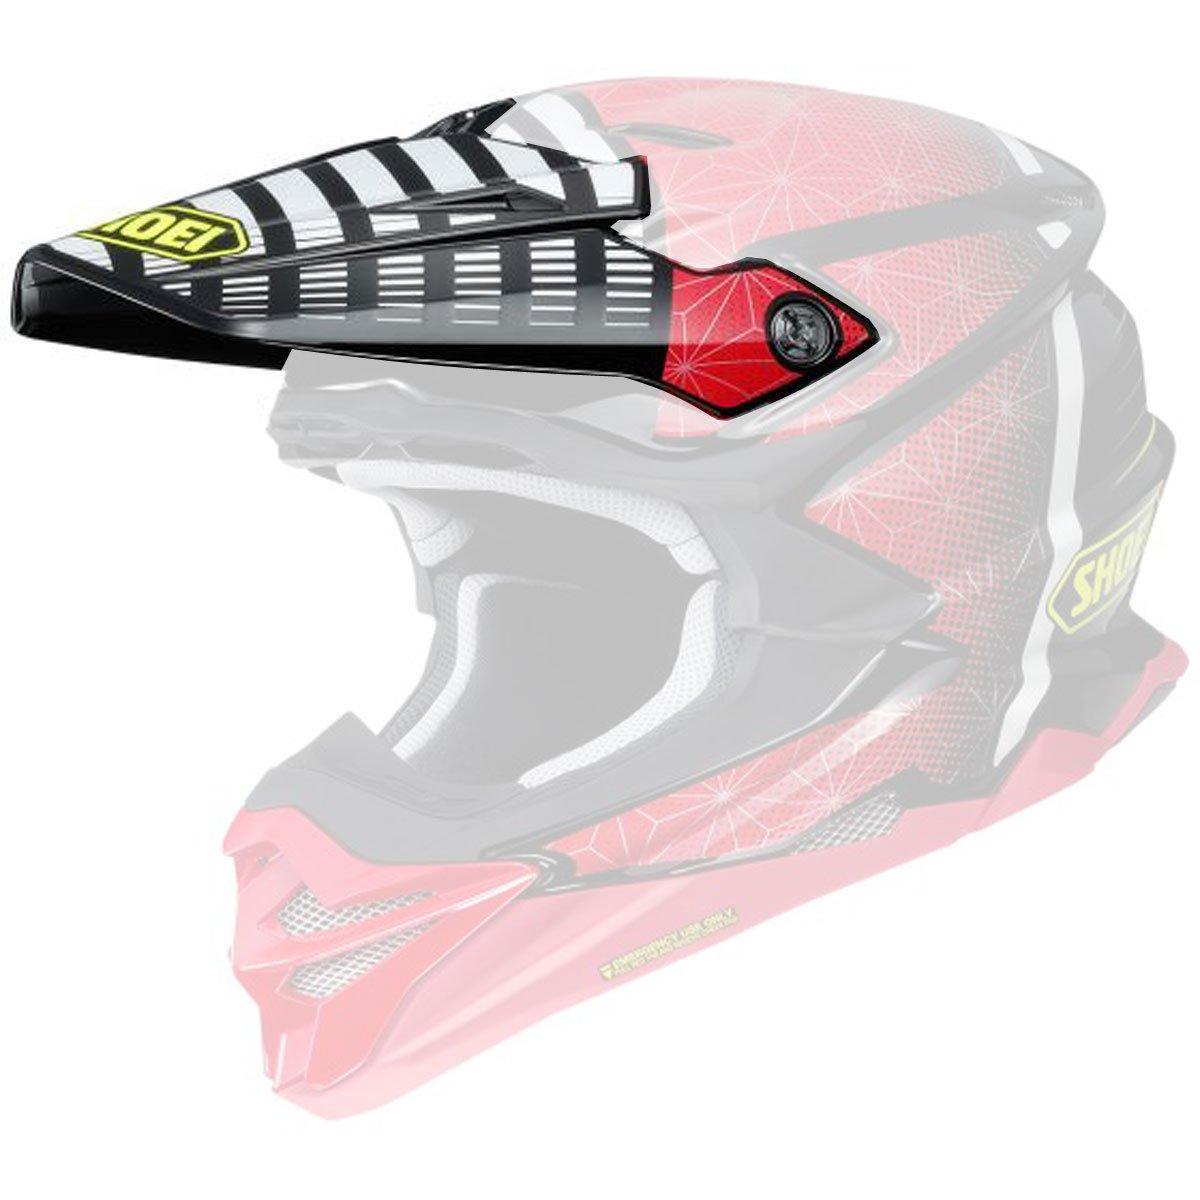 Shoei VFX-Evo Visor Blazon Off-Road Motorcycle Helmet Accessories - TC-1 / One Size